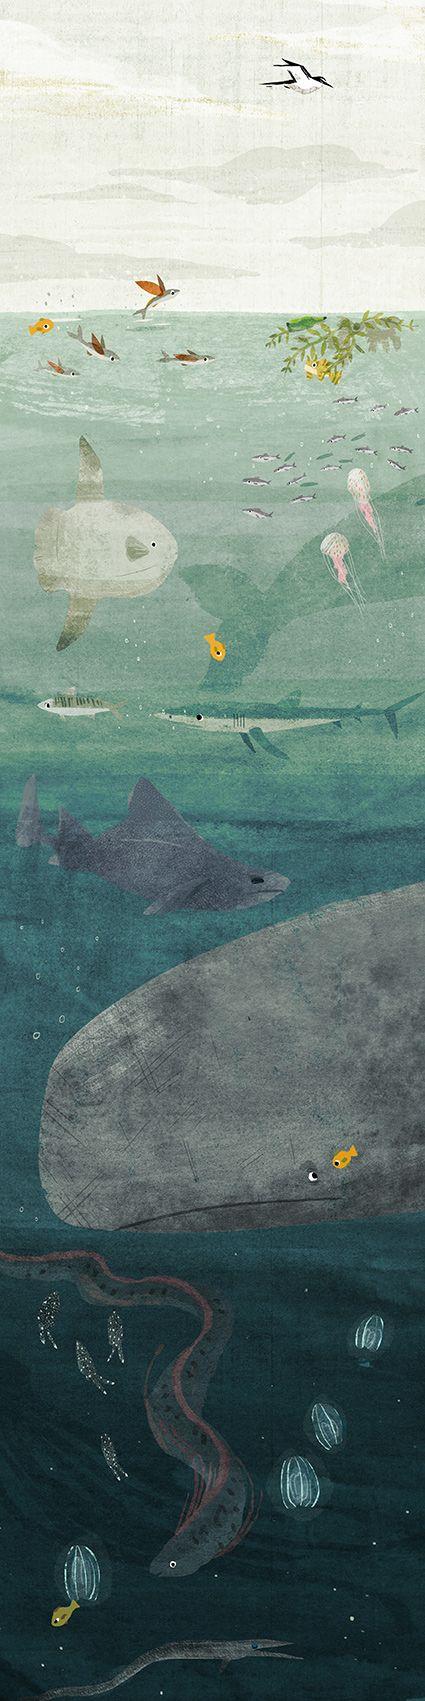 Information - Ella Bailey Illustration